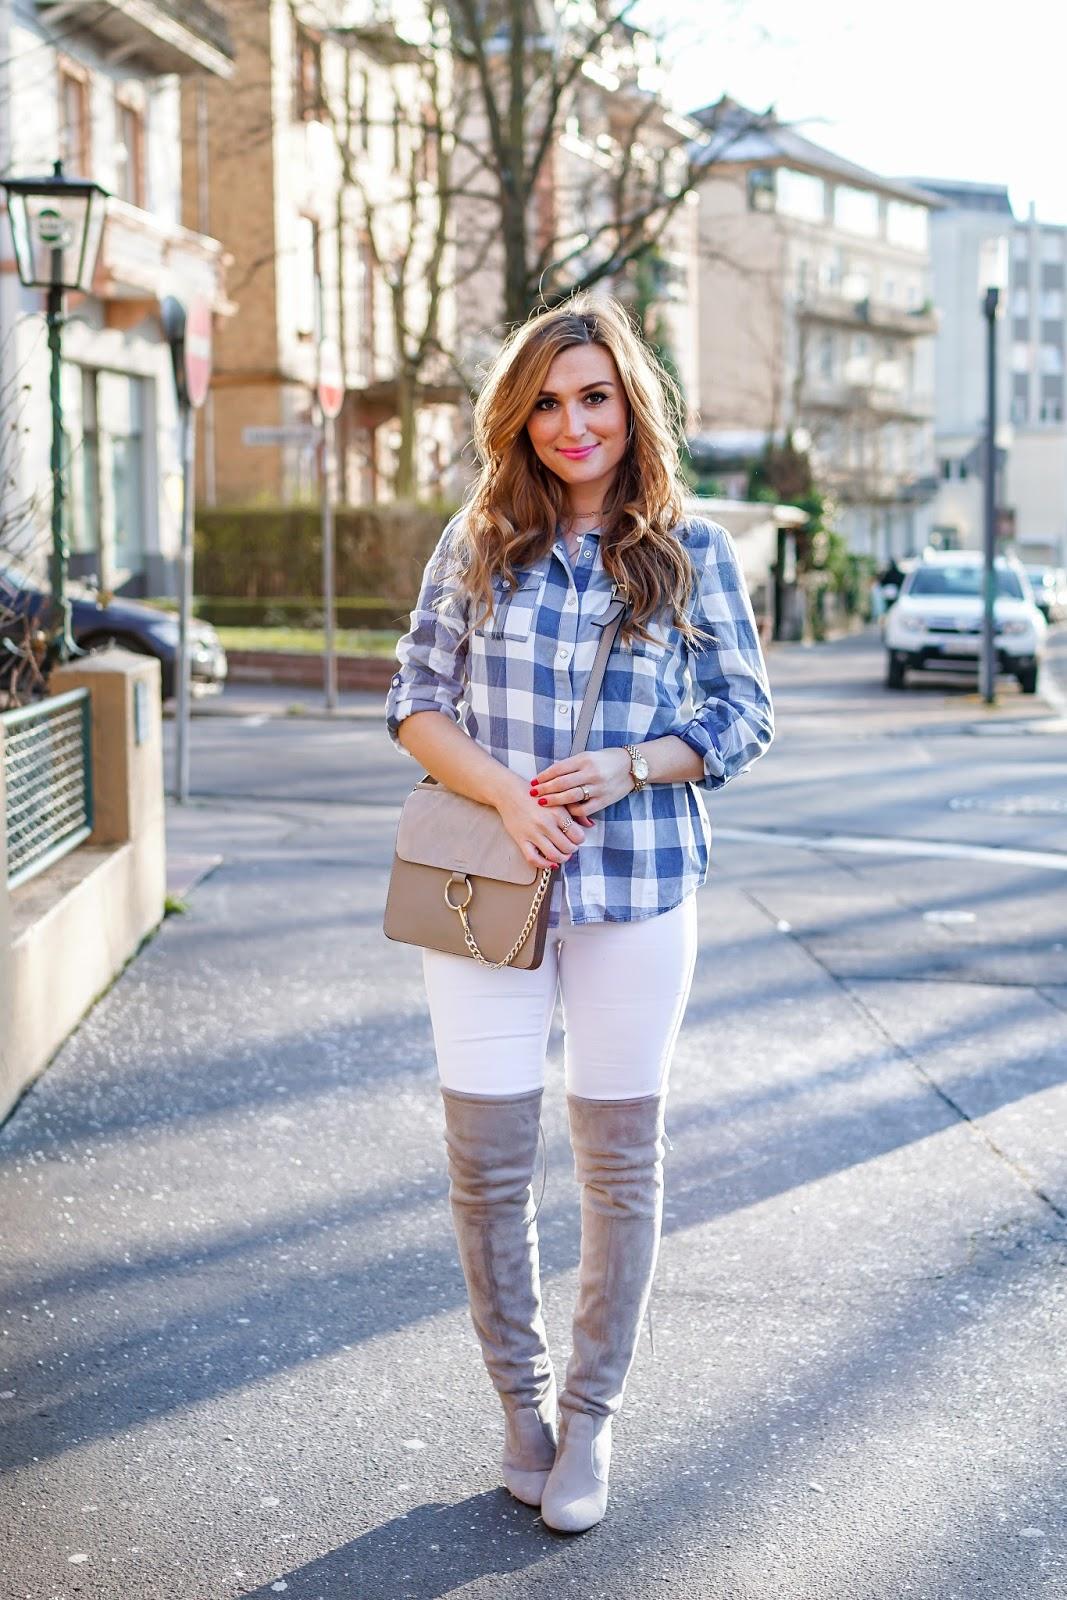 Karo-hemd-wie-stylt-man-ein-karo-hemd-karo-bluse-blaue-karobluse-karierte-bluse-fashionblogger-blogger-fashionstylebyjohanna